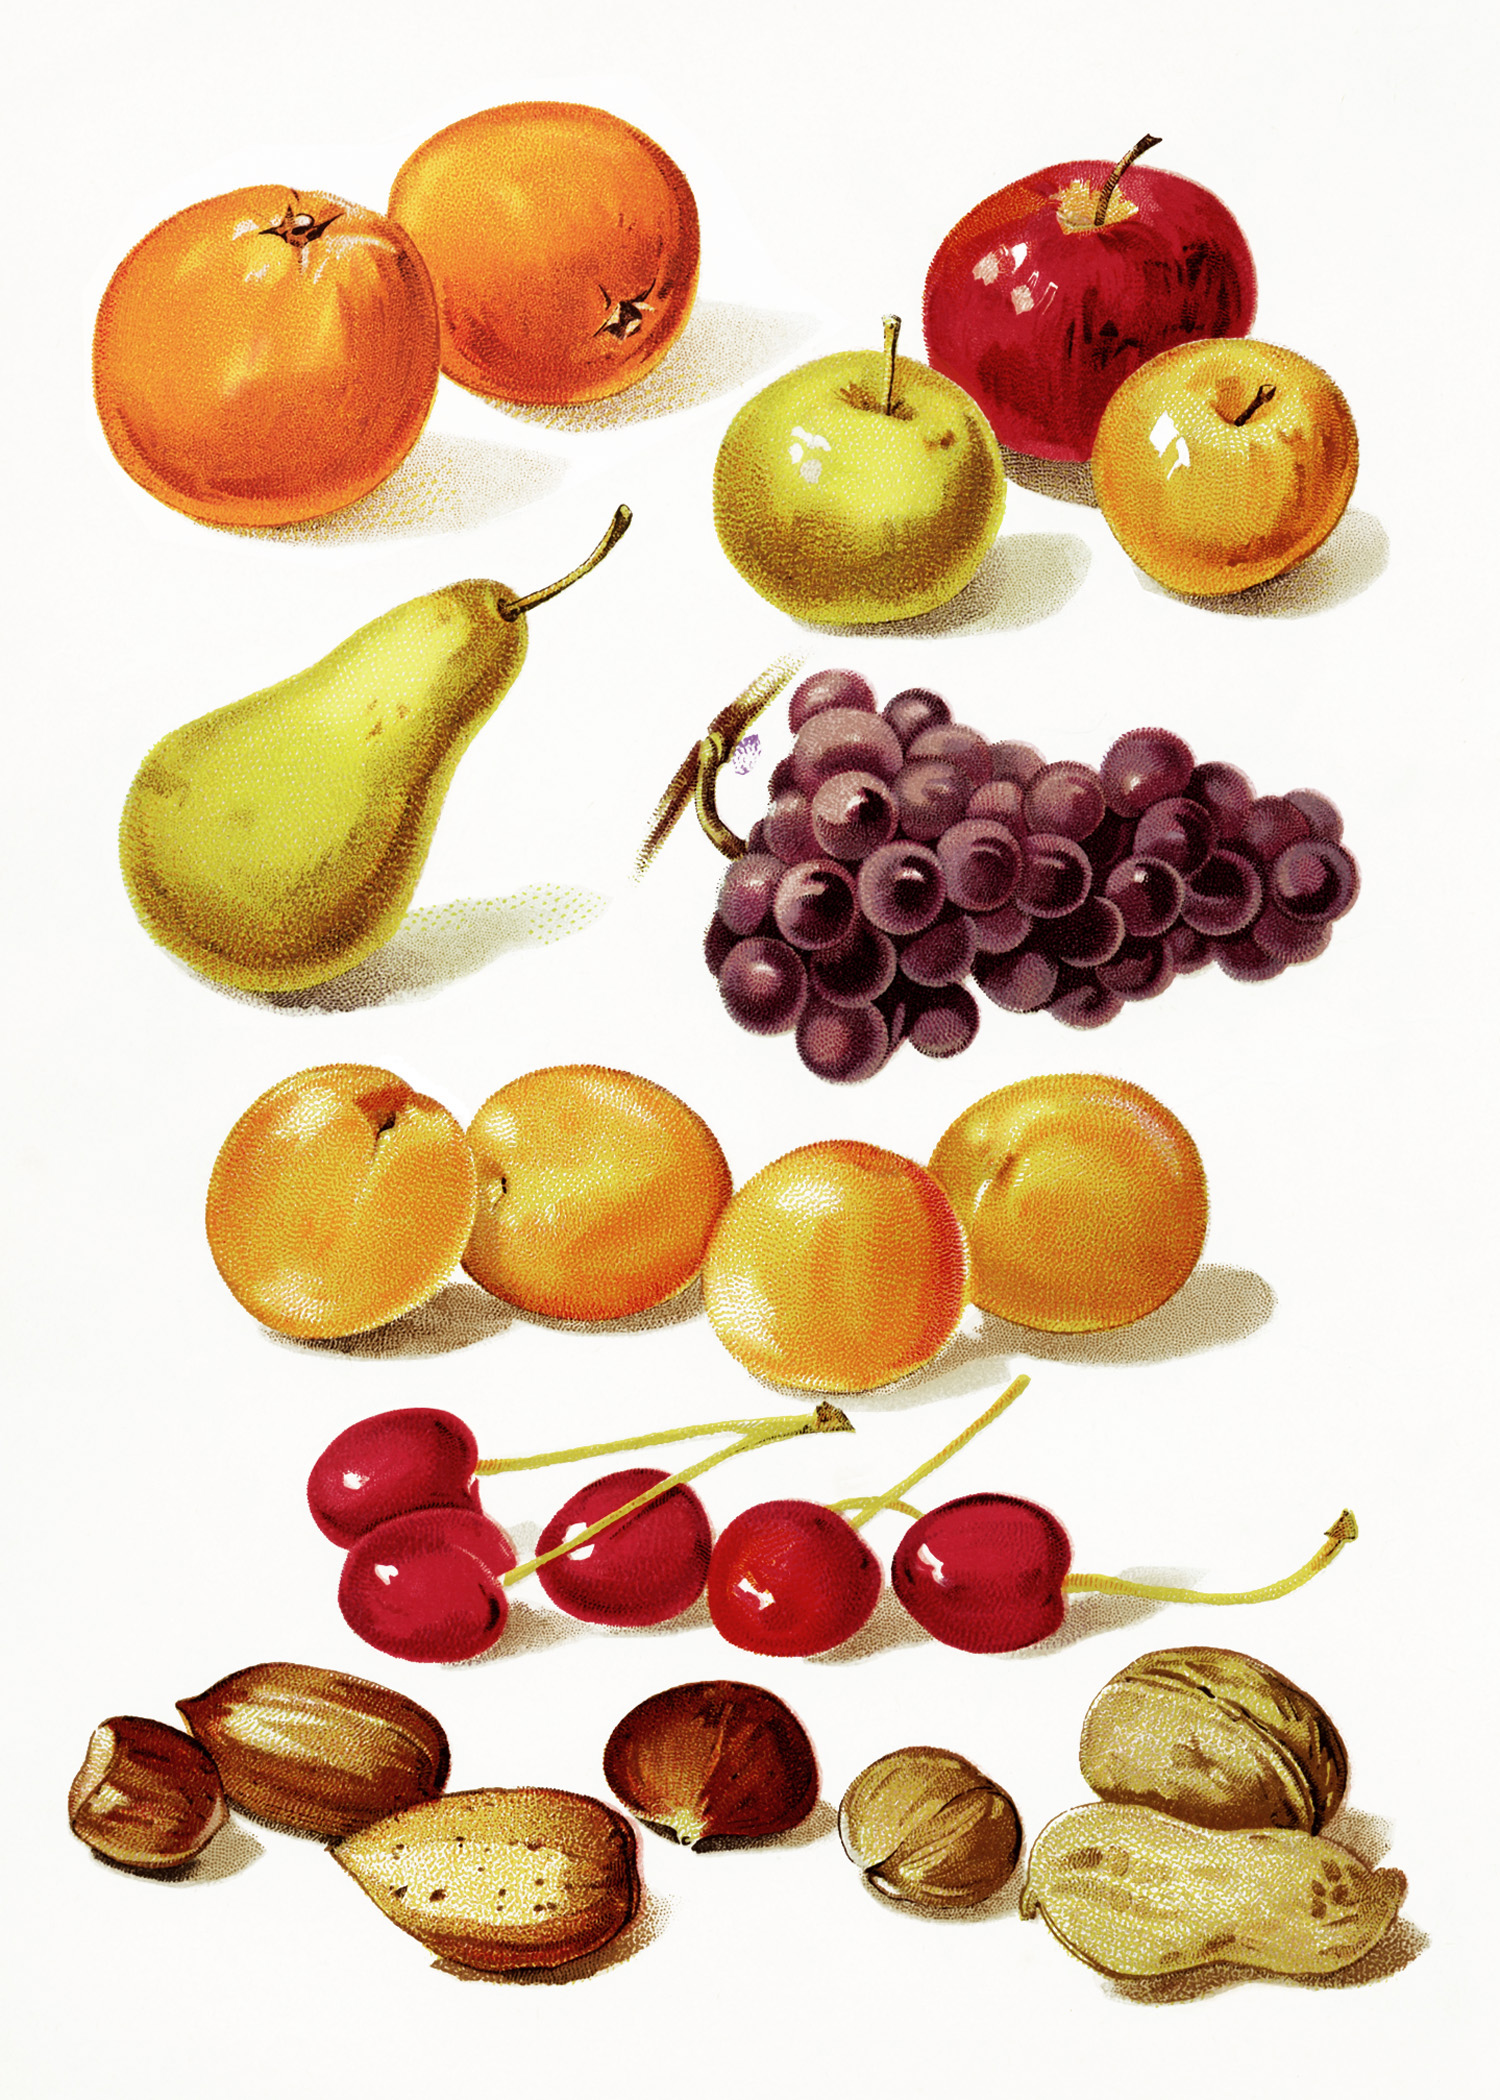 1500x2100 Page Of Fruit And Nuts ~ Free Vintage Image Old Design Shop Blog